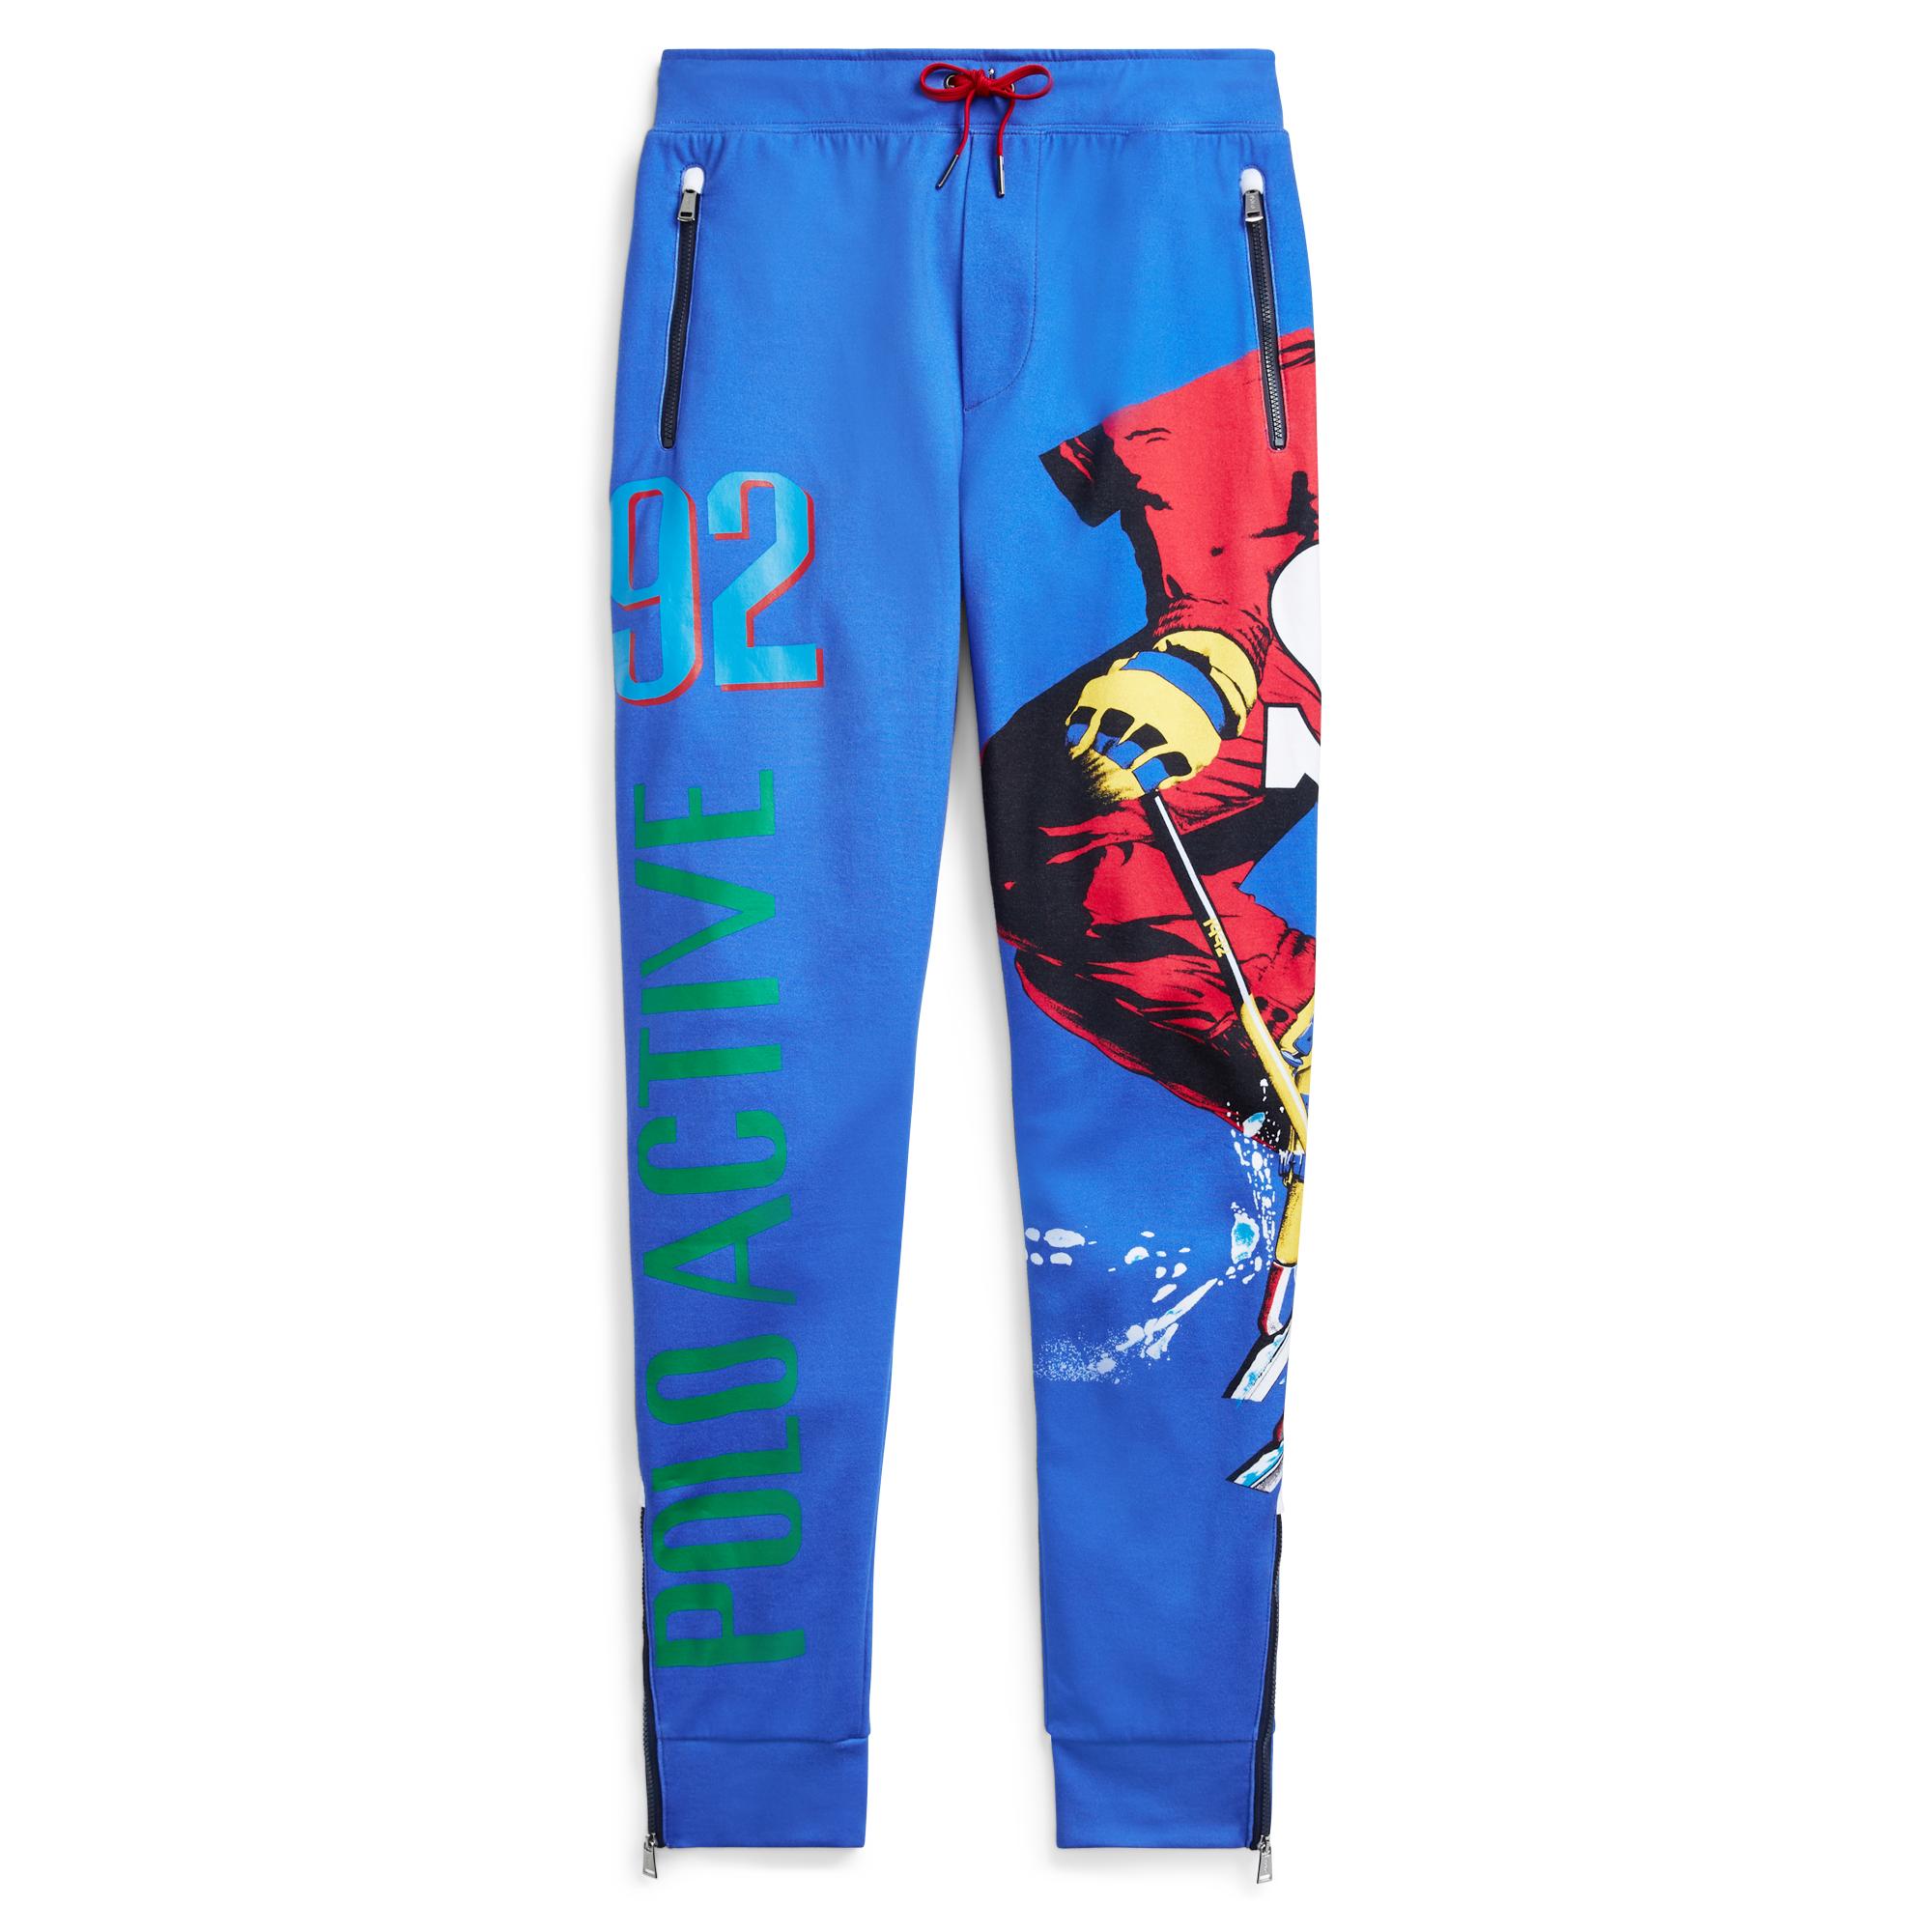 63ef60a07 Ski 92 sweatpants Athletic Pants